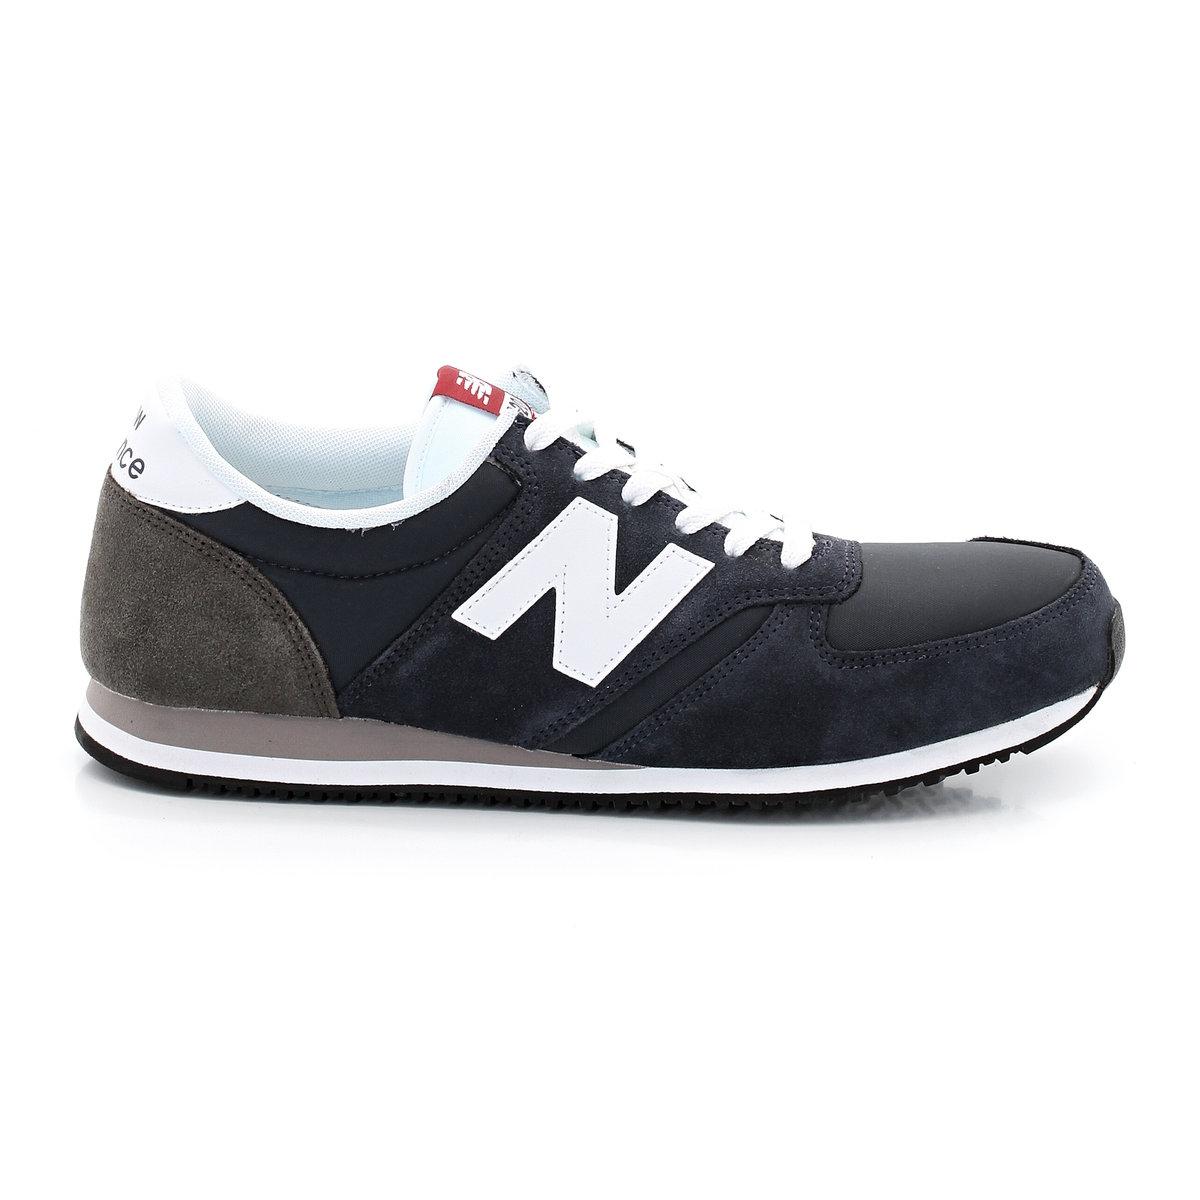 Кроссовки низкие NEW BALANCE U420CNWНизкие кроссовки NEW BALANCE U420CNW Подкладка: текстиль. Стелька: текстиль. Подошва: синтетика. Верх: замша + нейлон. Застёжка: шнуровка<br><br>Цвет: темно-синий<br>Размер: 39 1/2